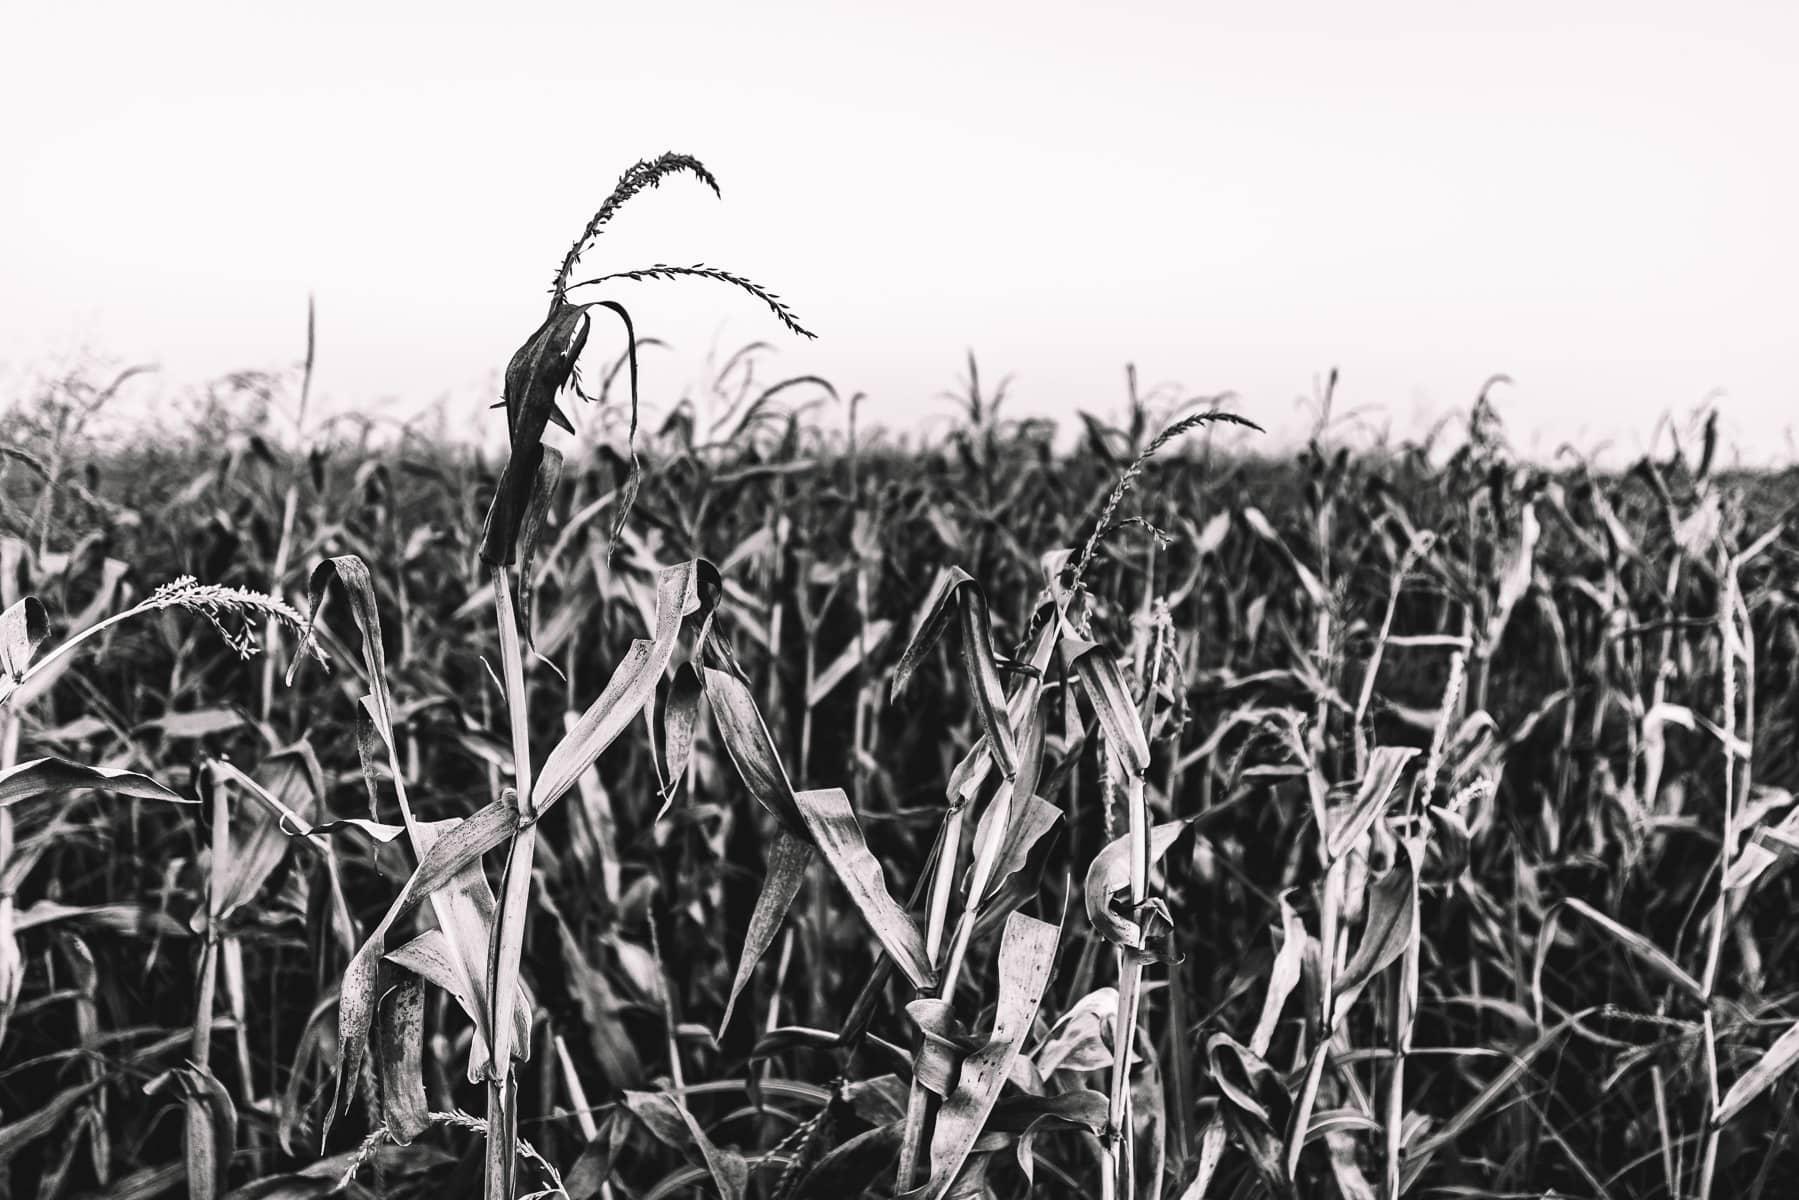 Desiccated cornstalks in a farm field near McKinney, Texas.